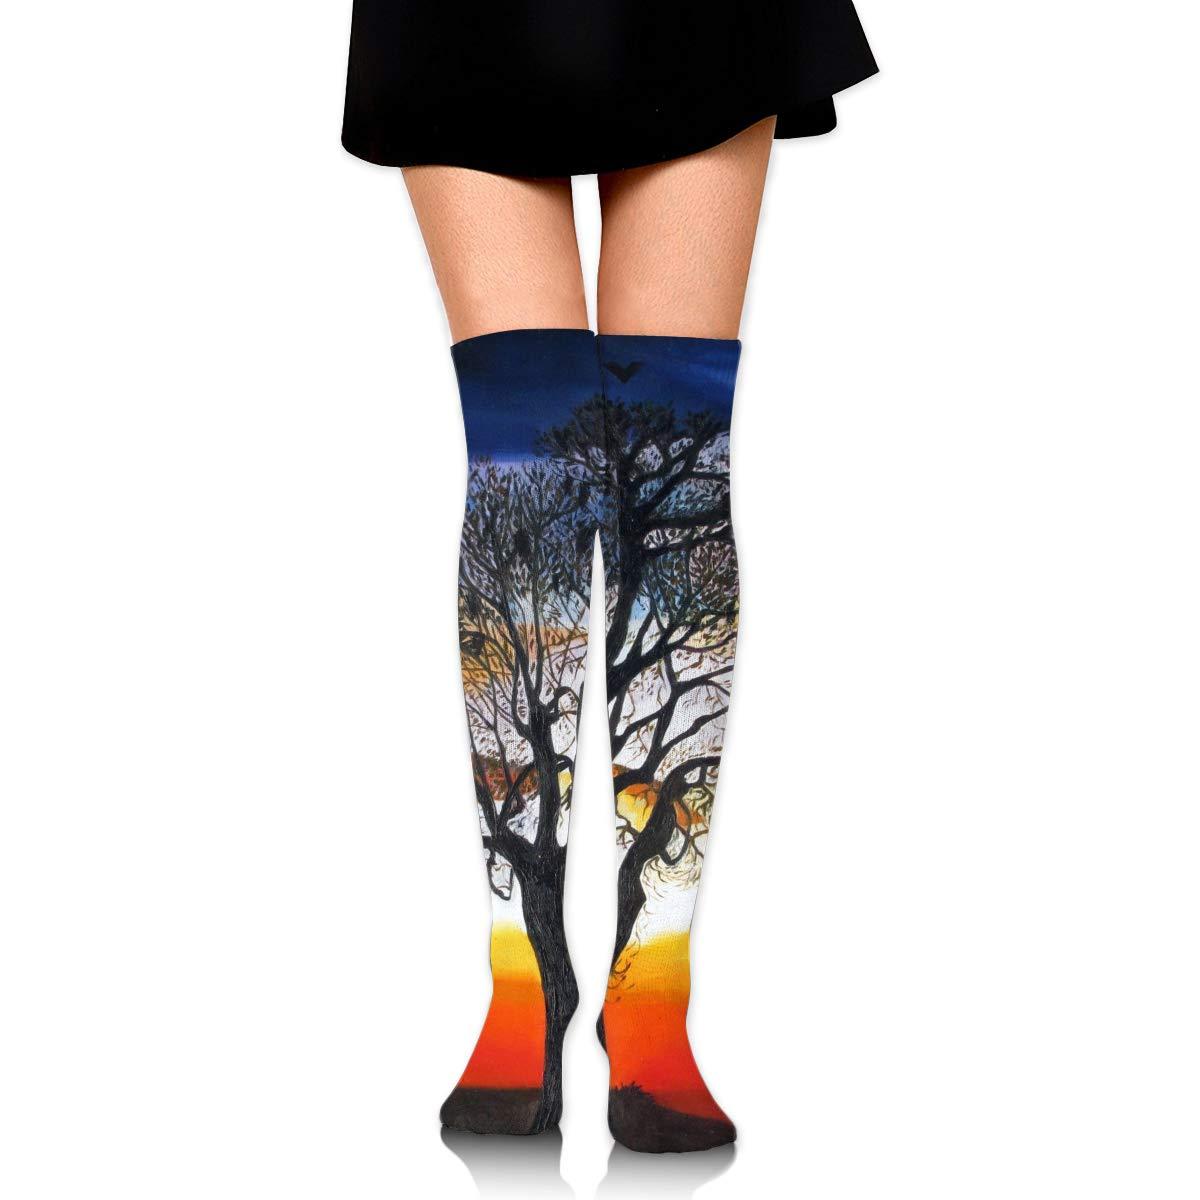 High Elasticity Girl Cotton Knee High Socks Uniform Black Tree And Bats Birds Women Tube Socks